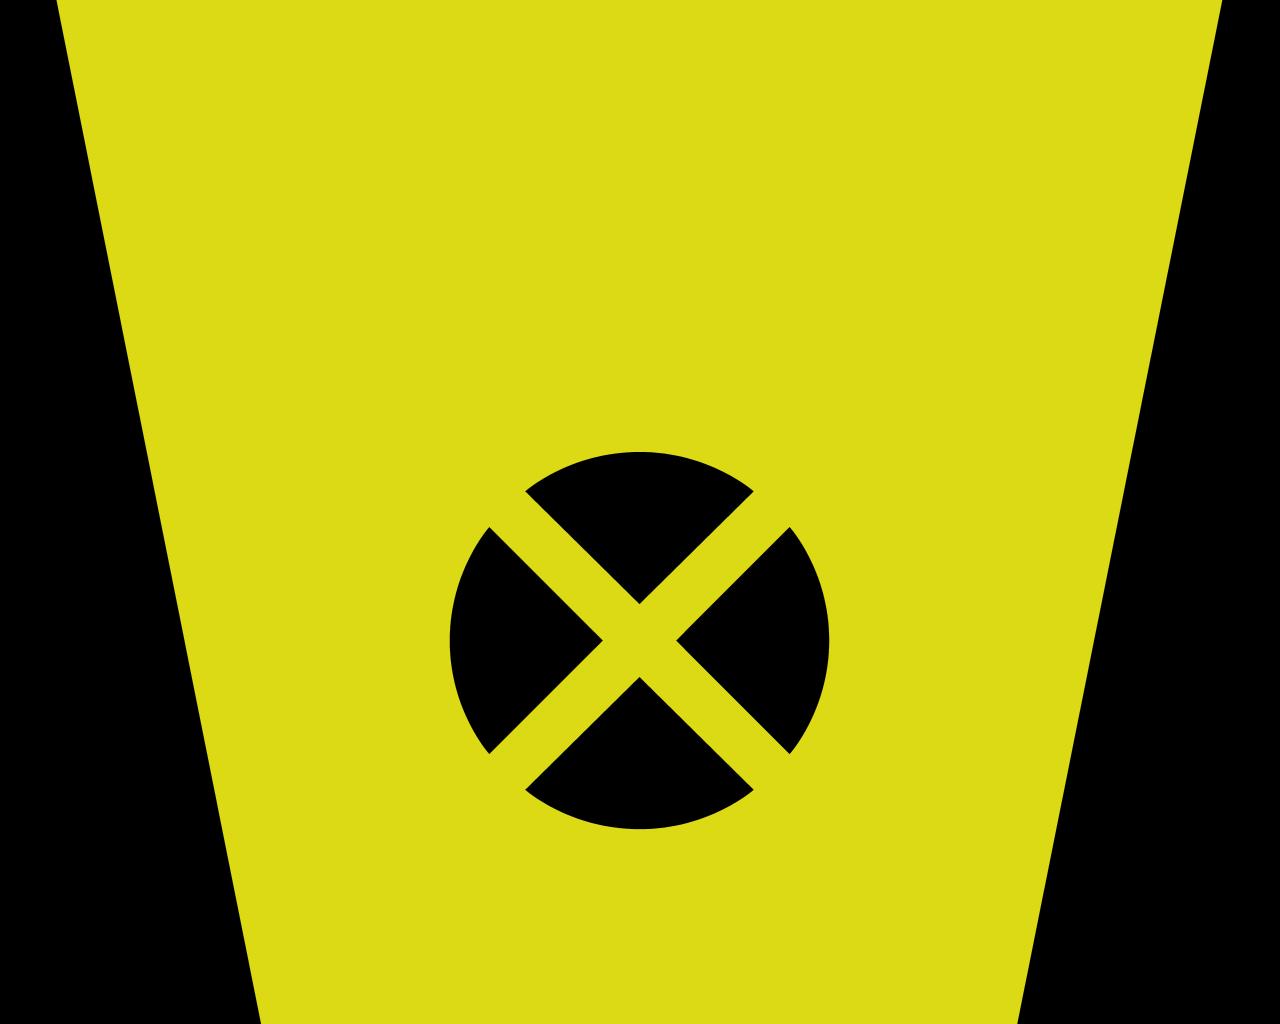 X men logo wallpaper hd dip awesomeness pinterest wallpaper x men logo wallpaper hd dip biocorpaavc